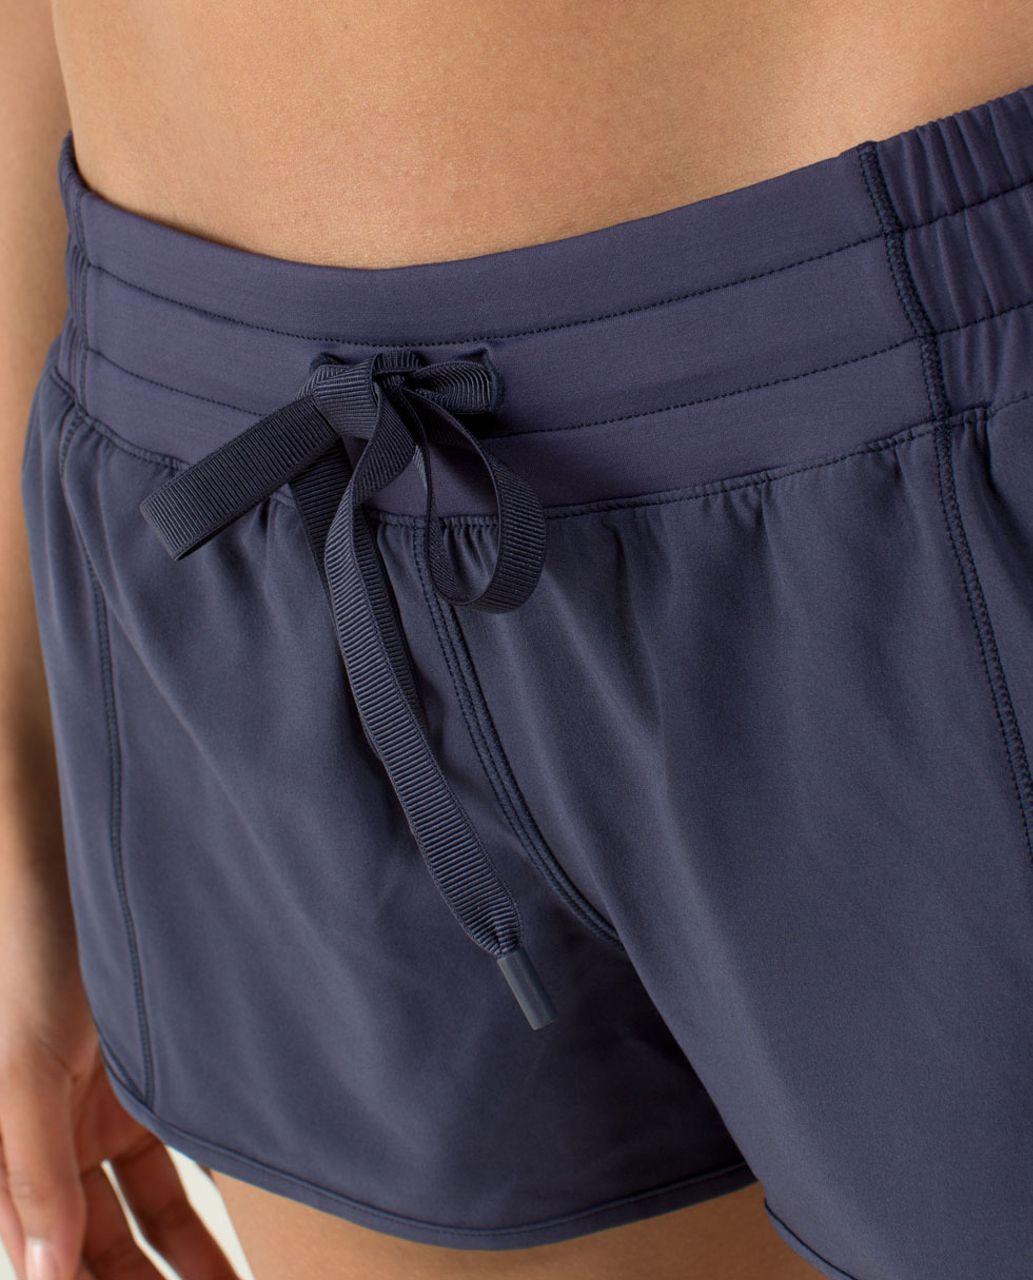 Lululemon Hotty Hot Short - Cadet Blue